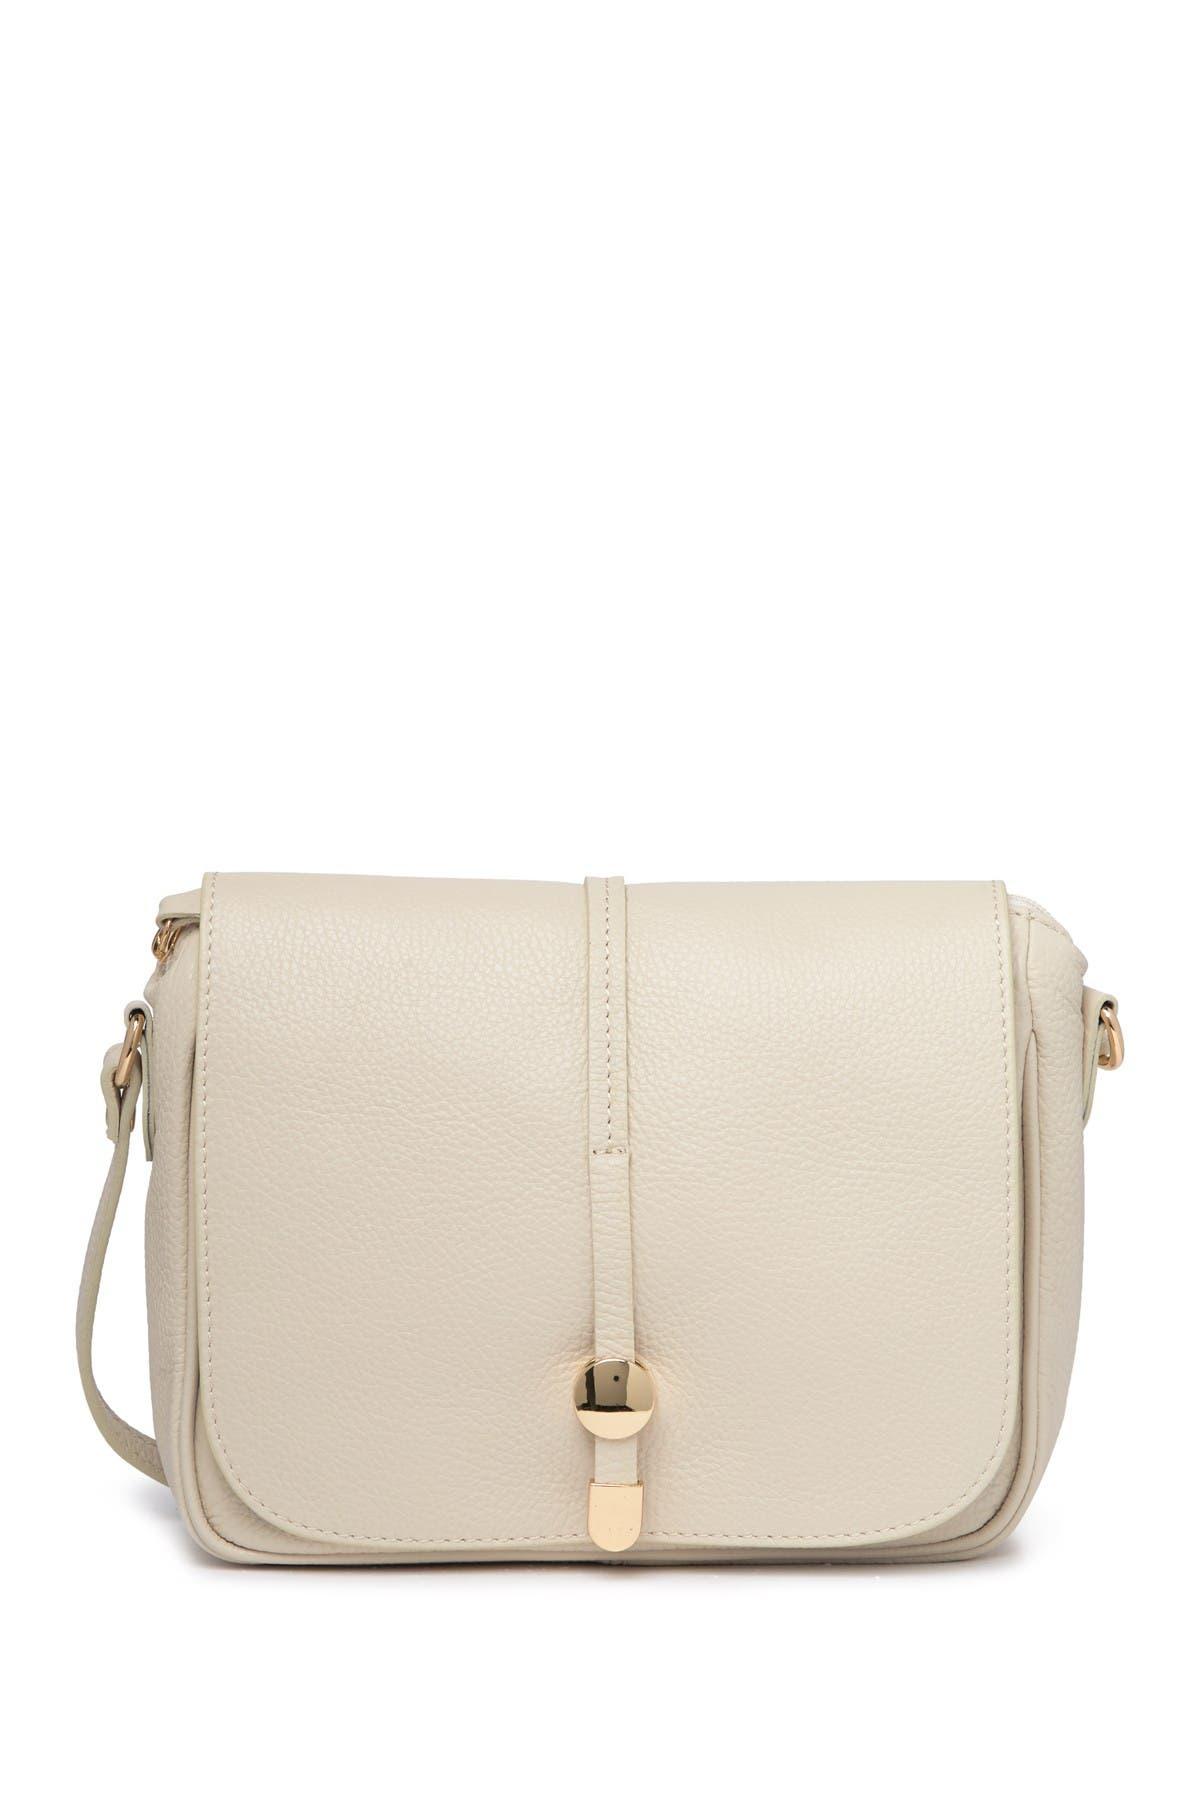 Image of Renata Corsi Leather Shoulder Bag